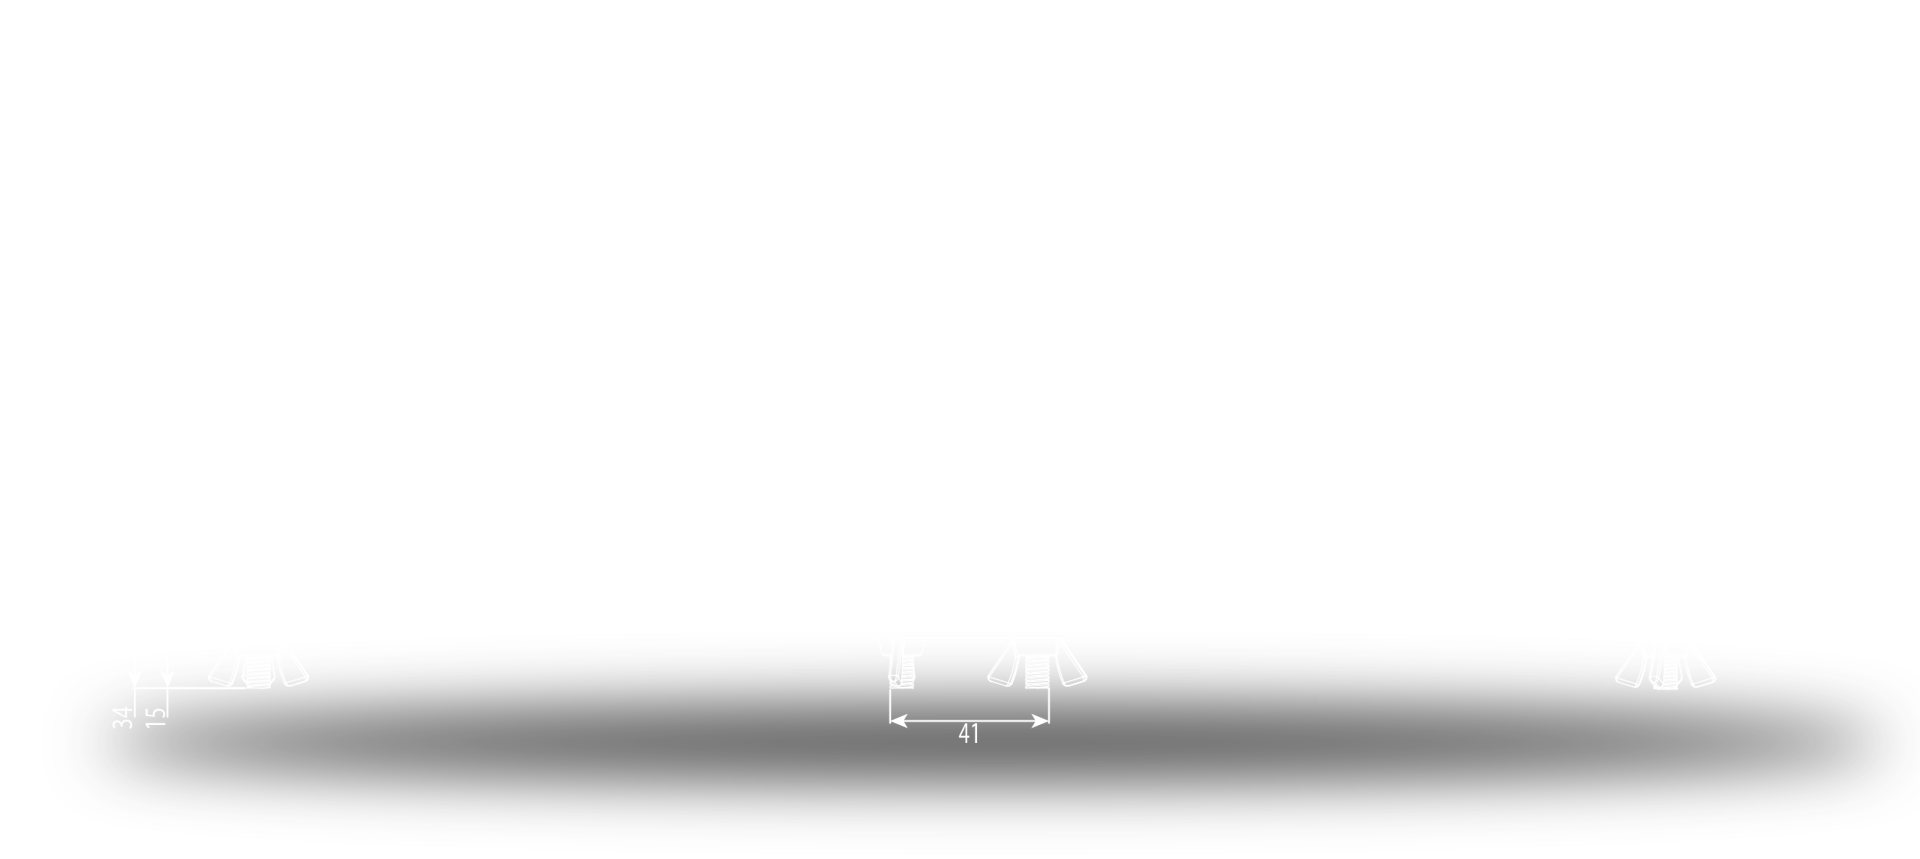 SD= image 6